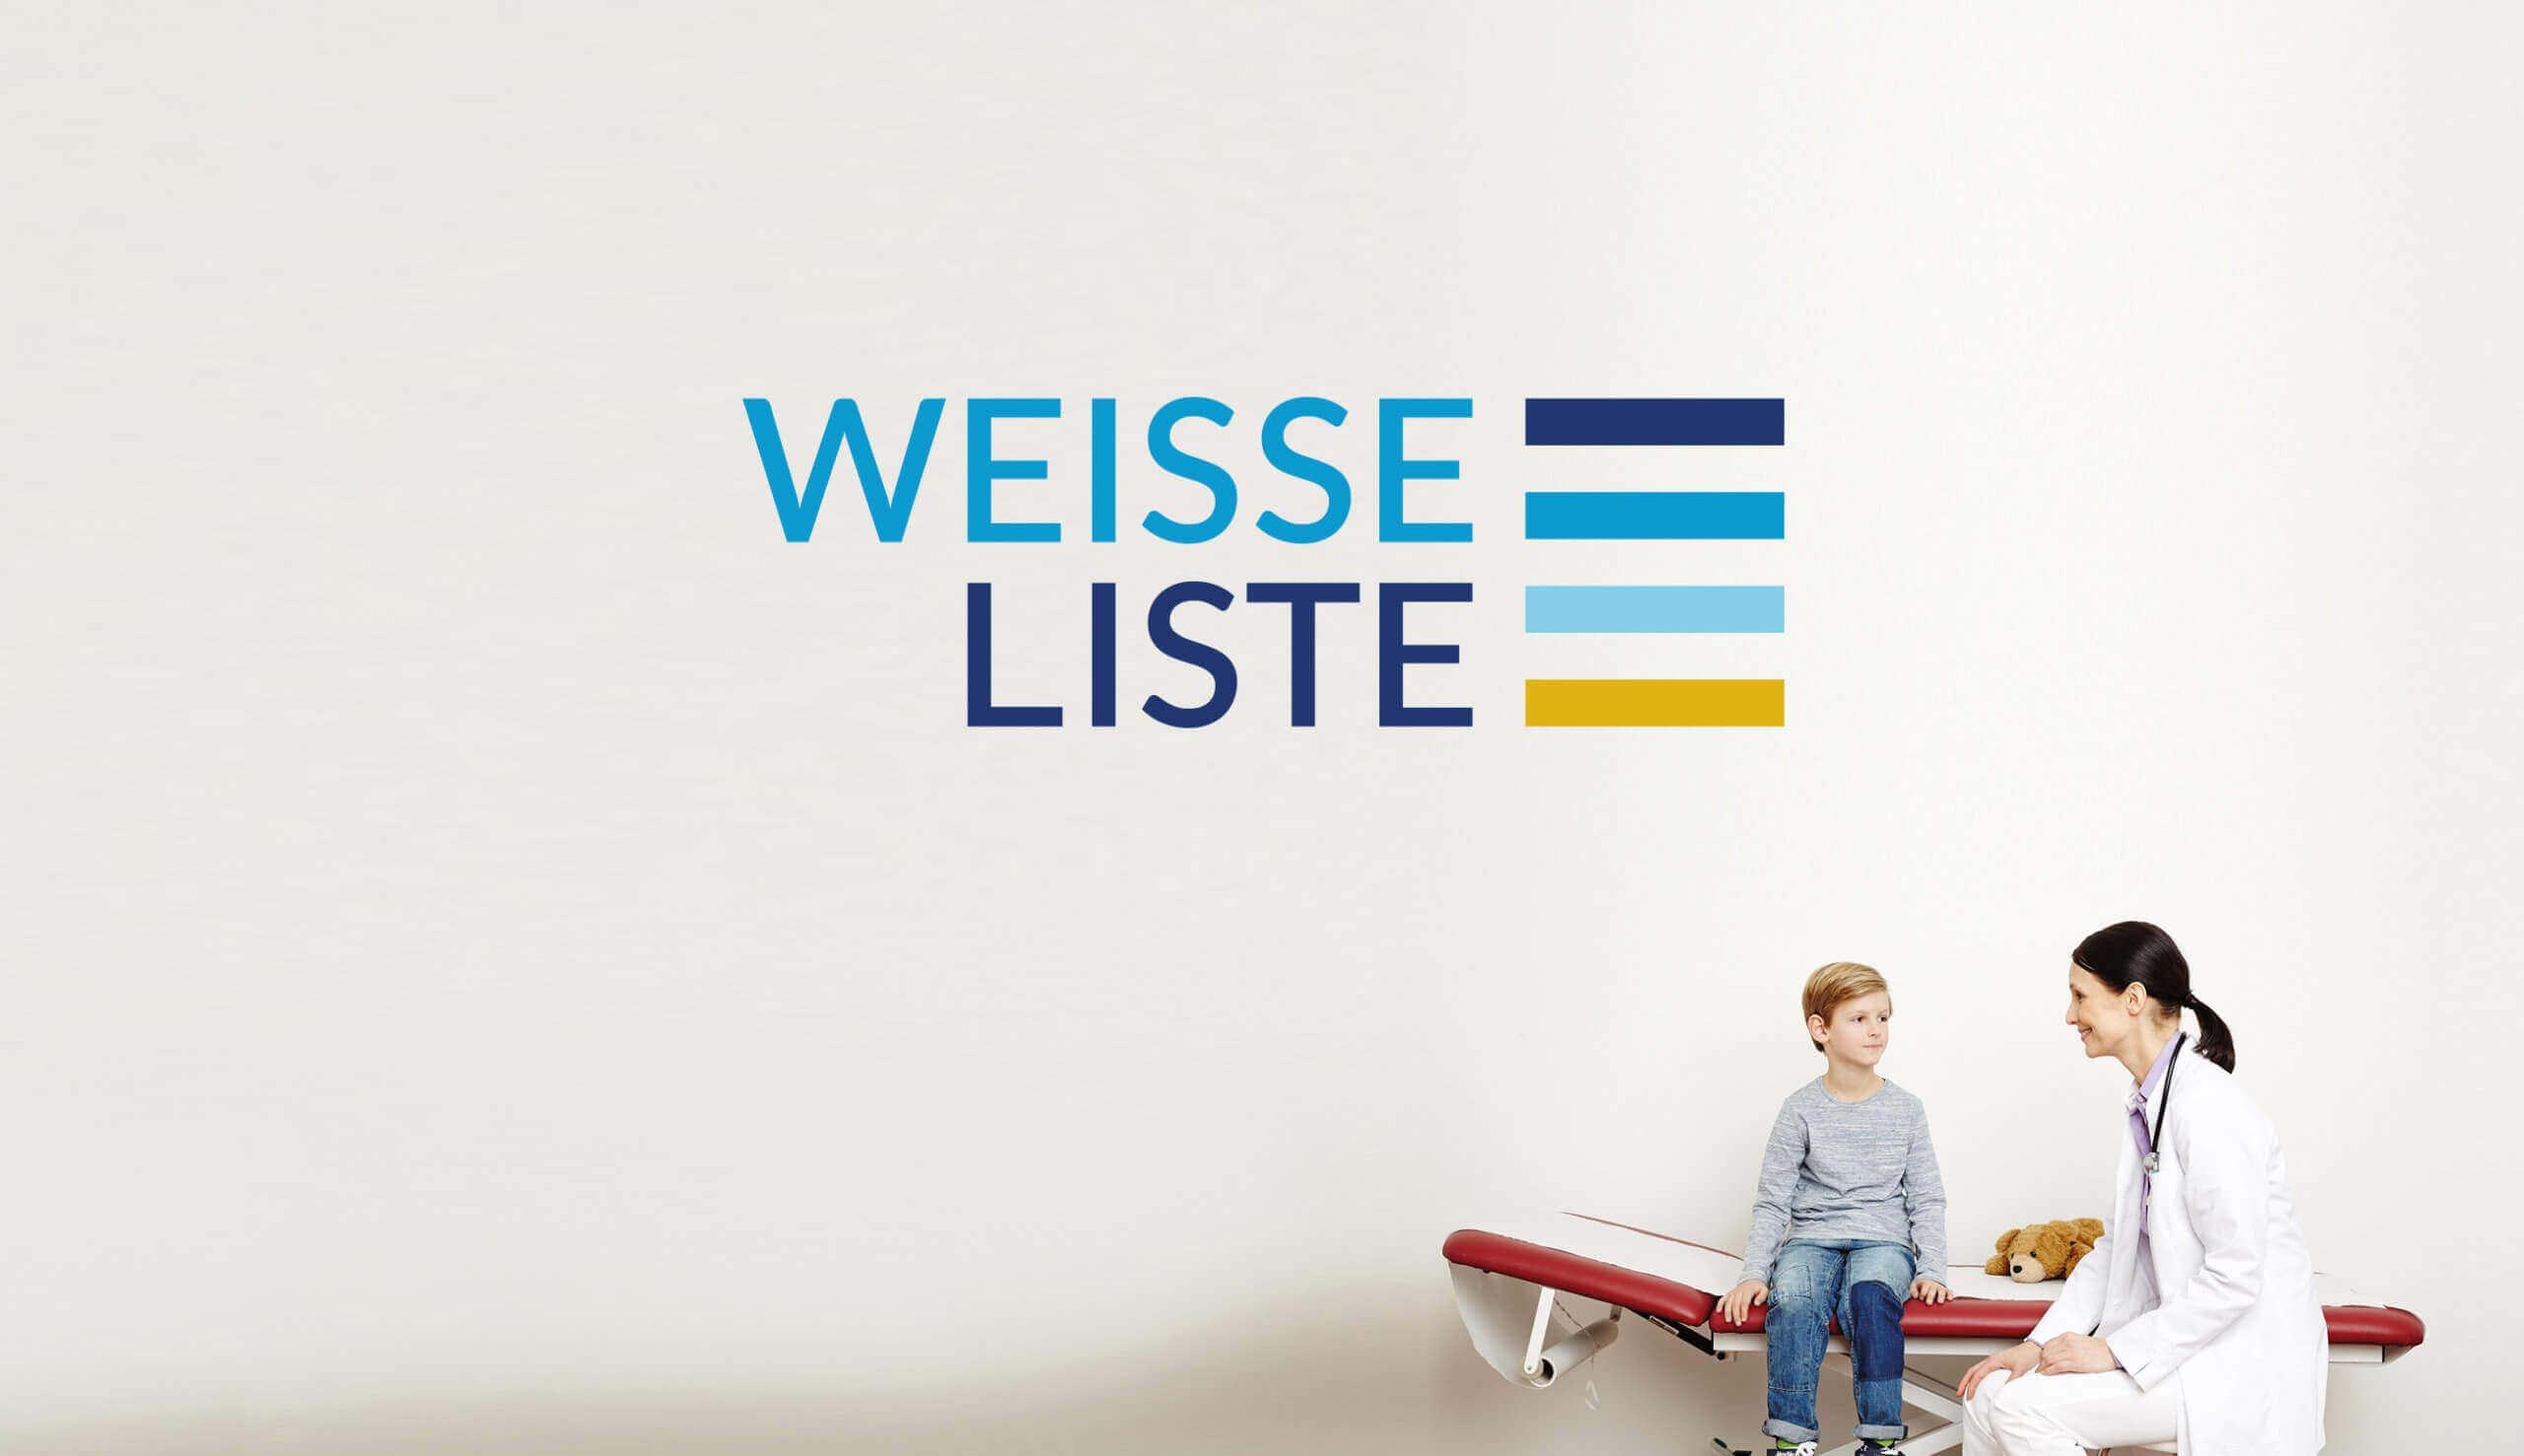 Weisse Liste Logo